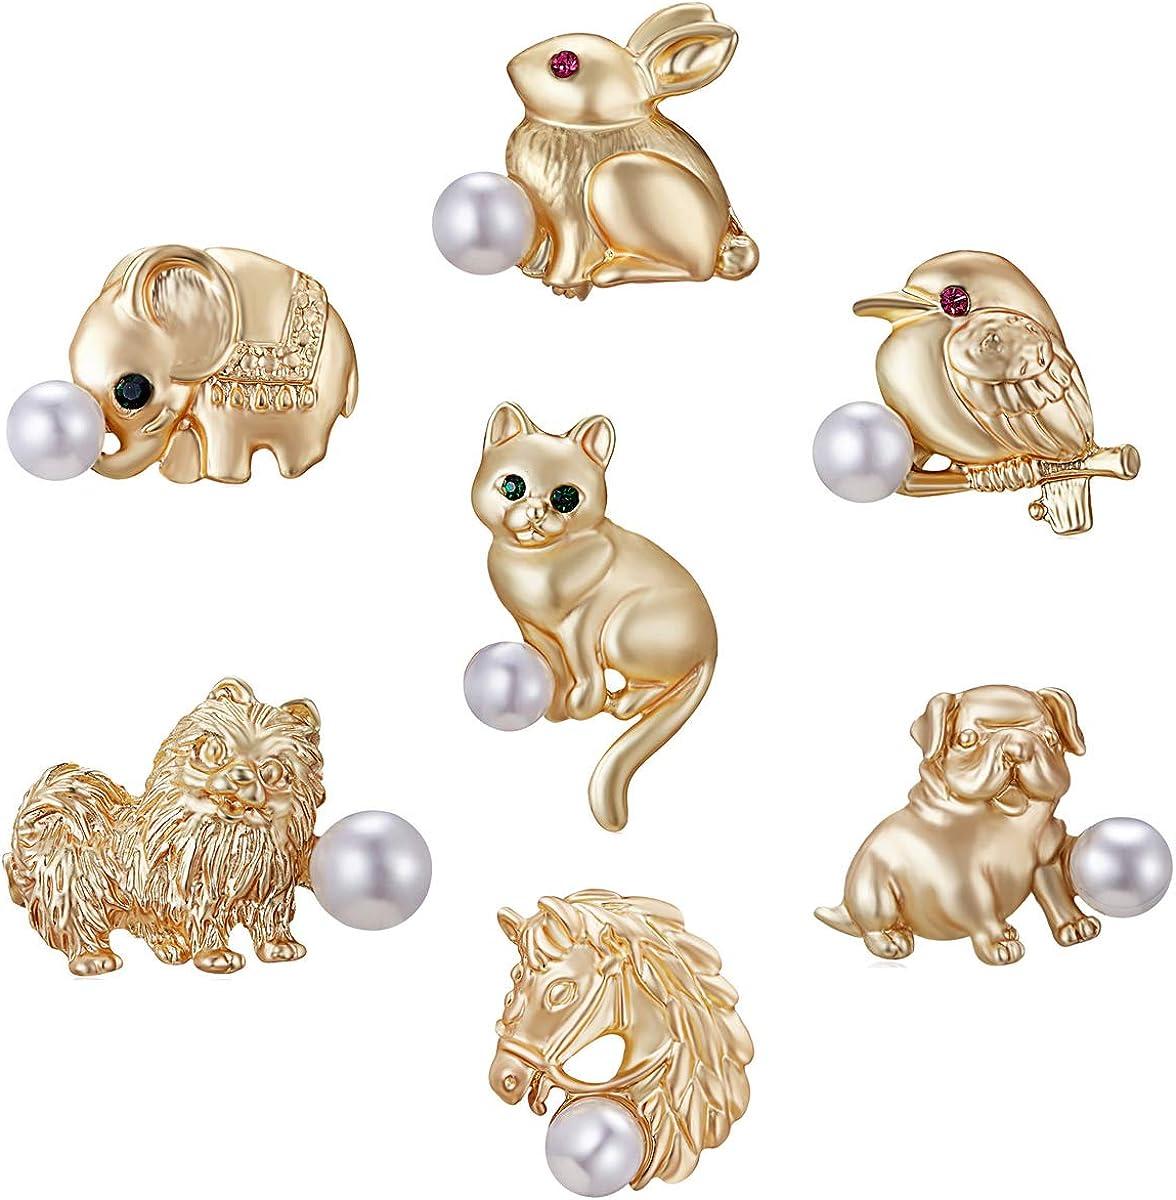 Womens Printing Pattern Horse Bird Cat Dog Animals Pins Brooch Fashion Jewellery